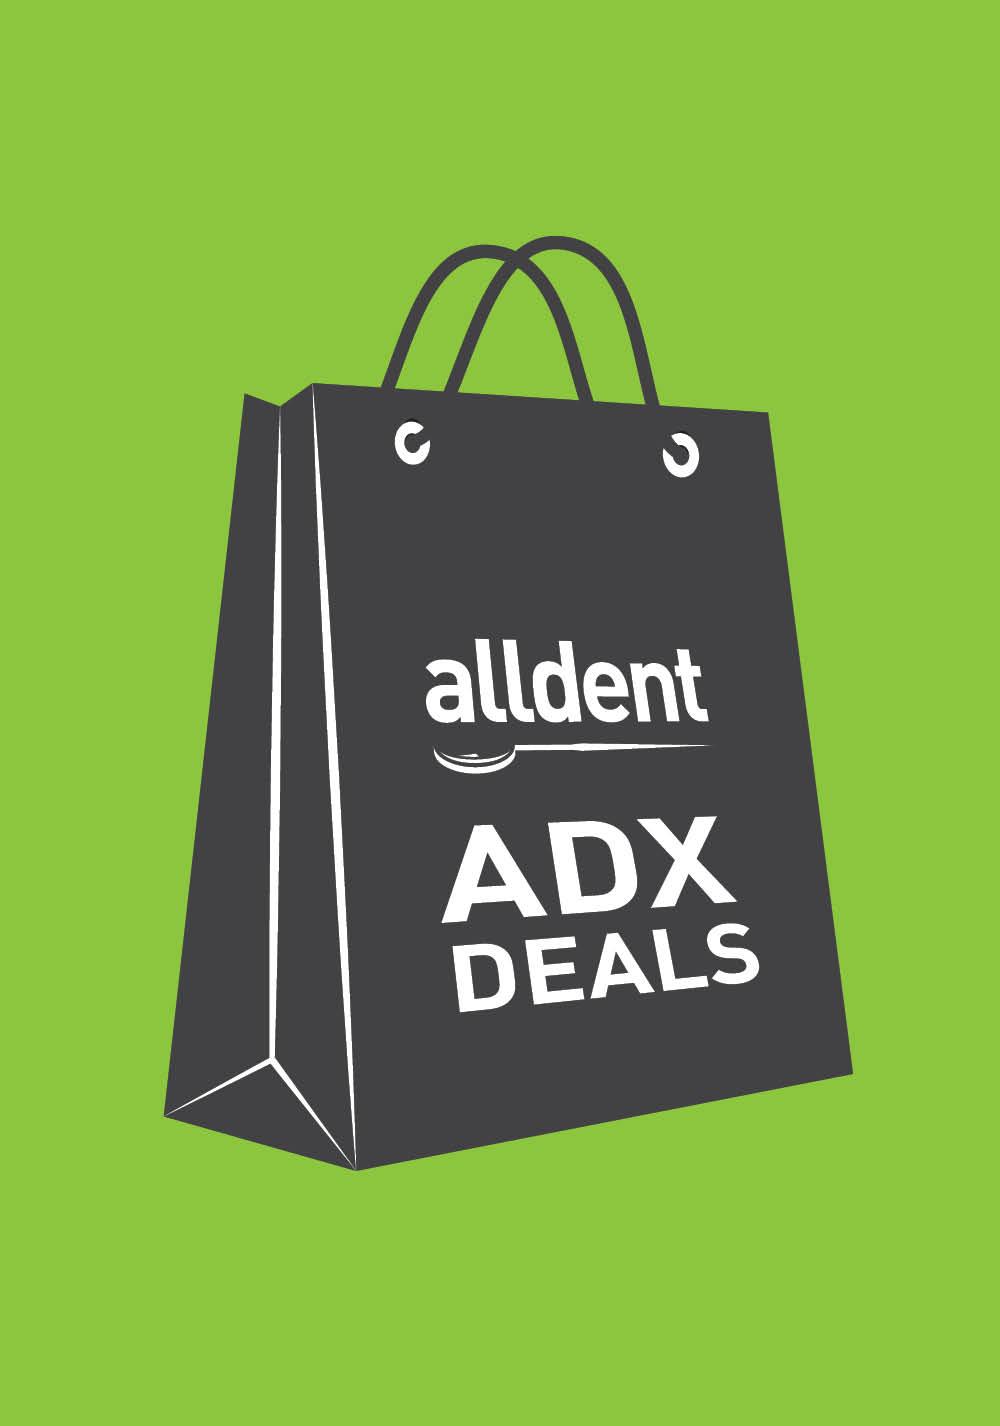 #alldent